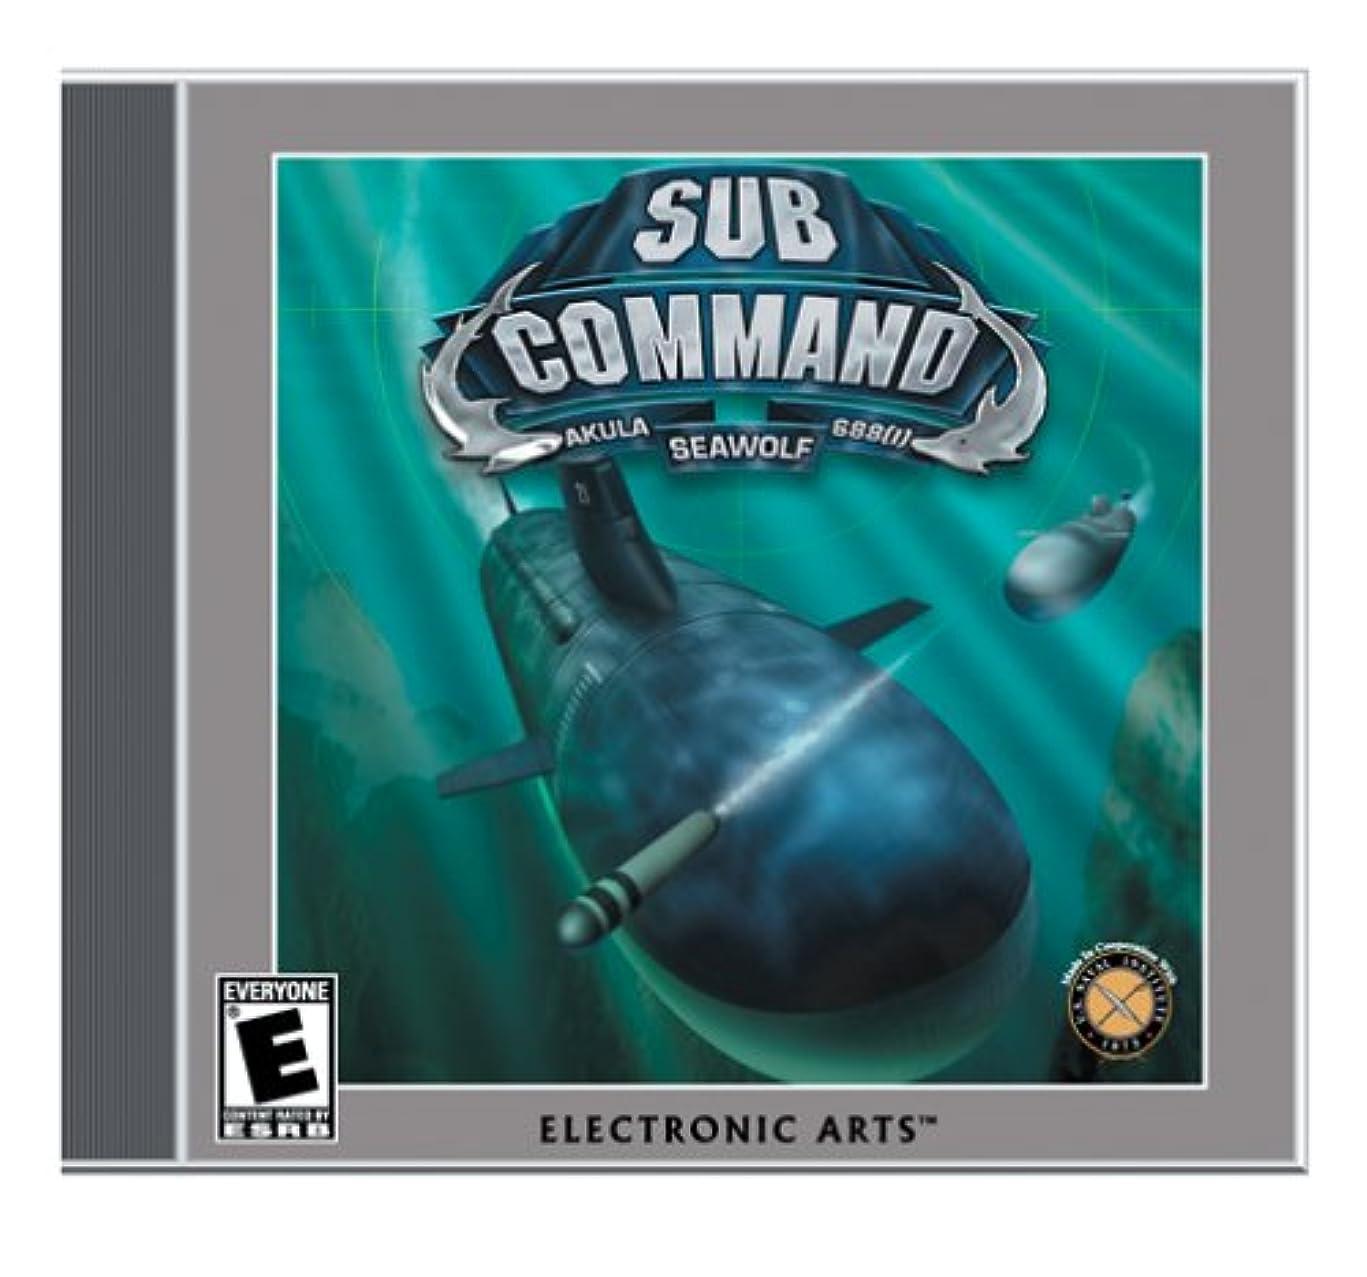 Sub Command (Jewel Case) (輸入版)